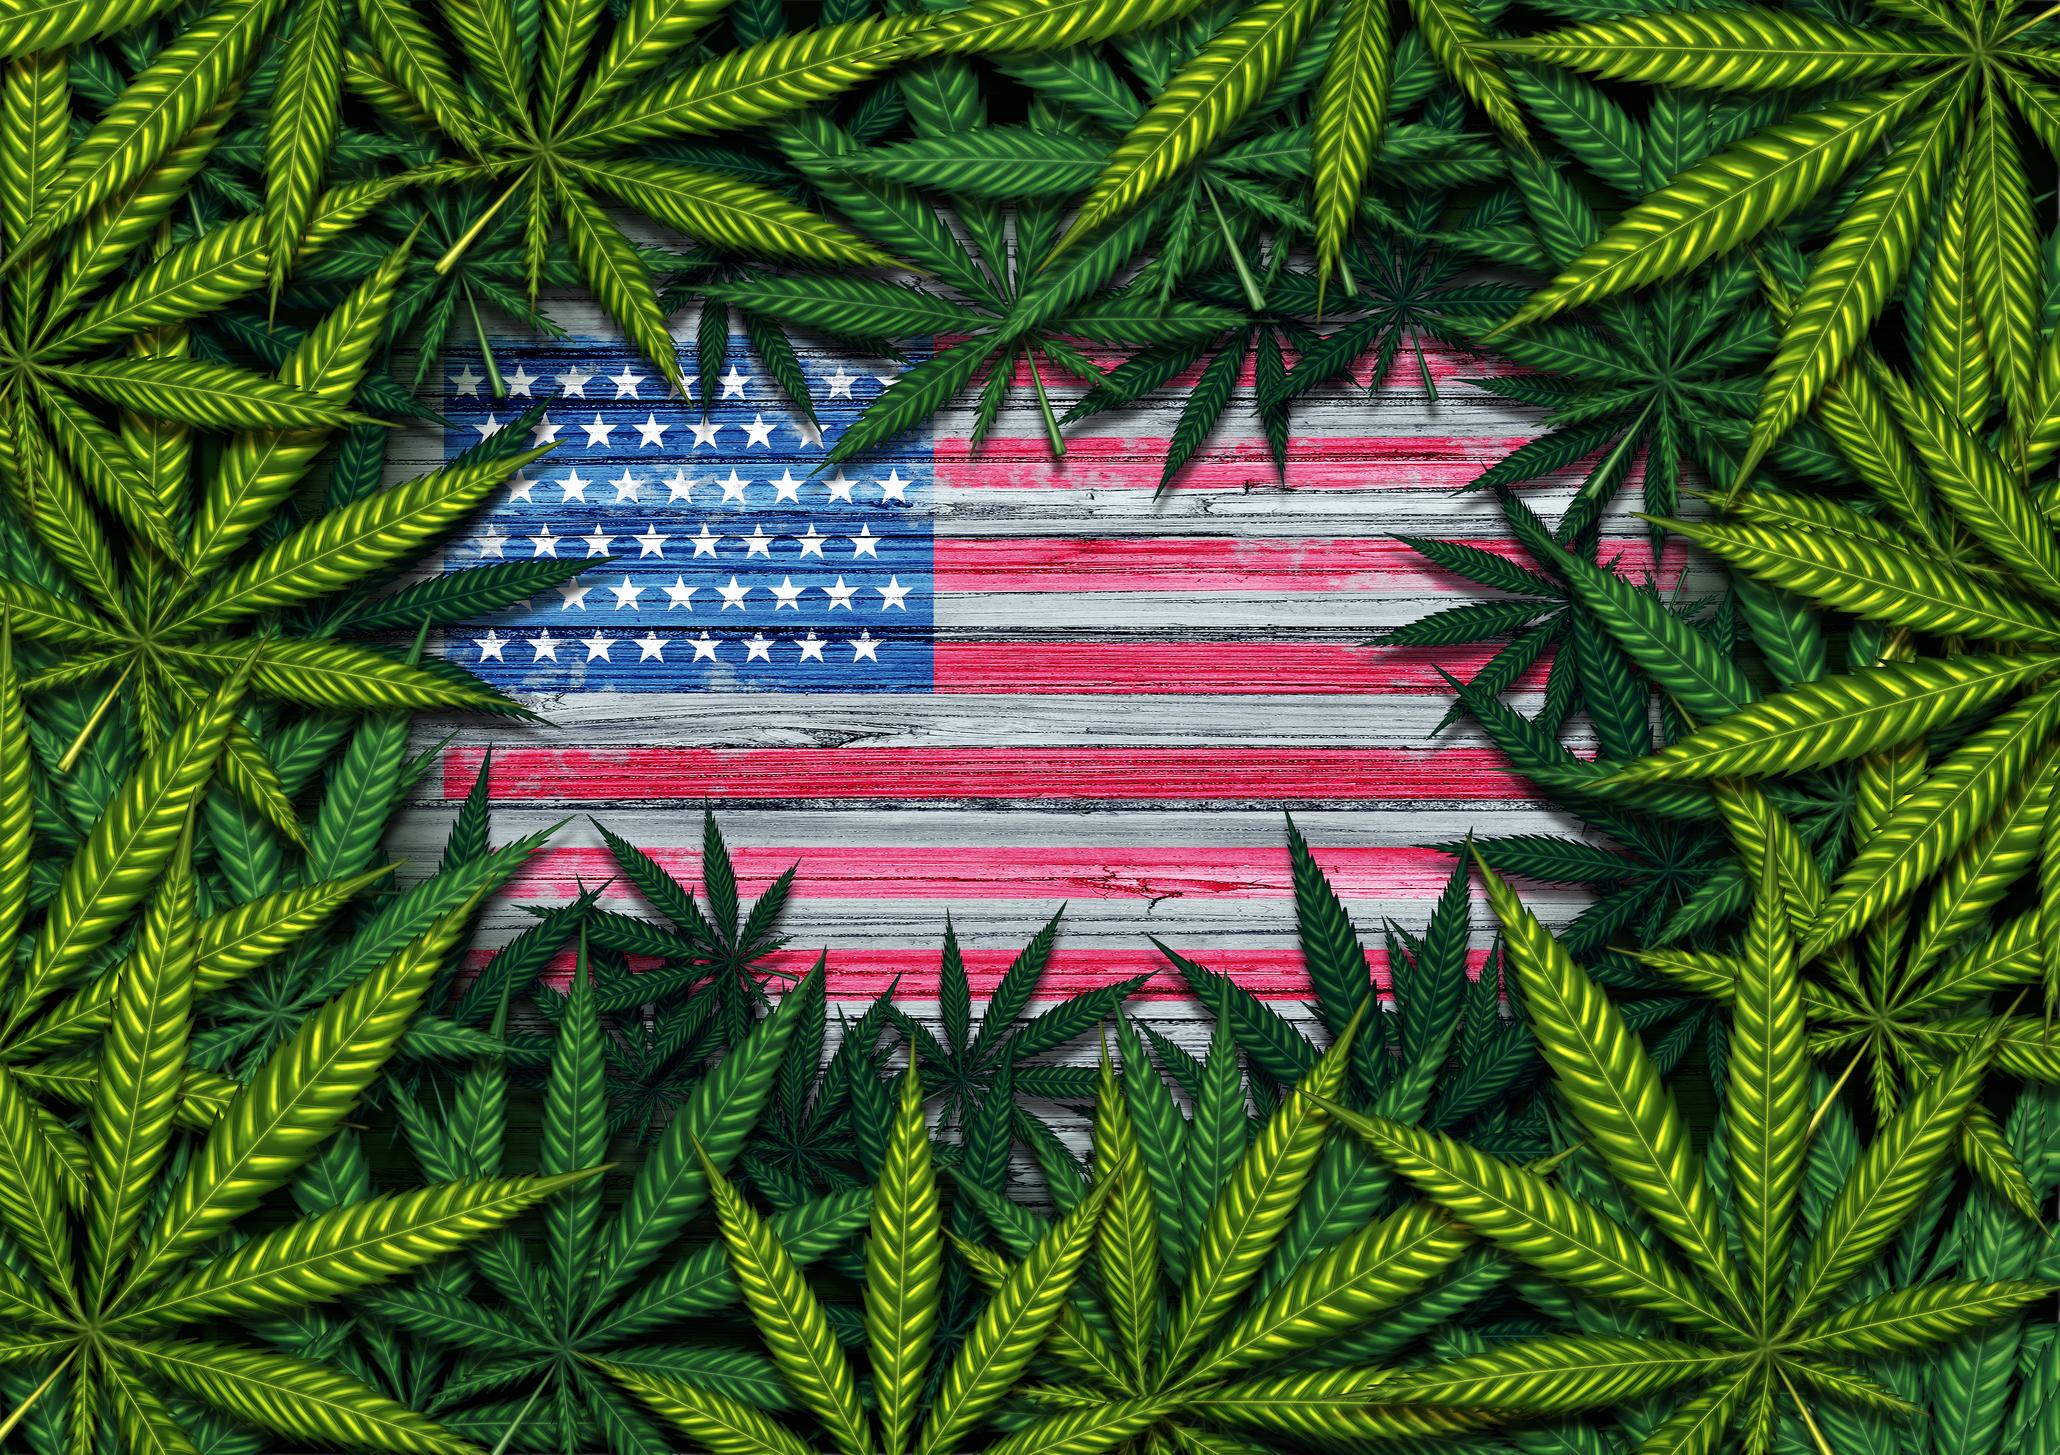 A U.S. flag partly hidden under pot leaves.